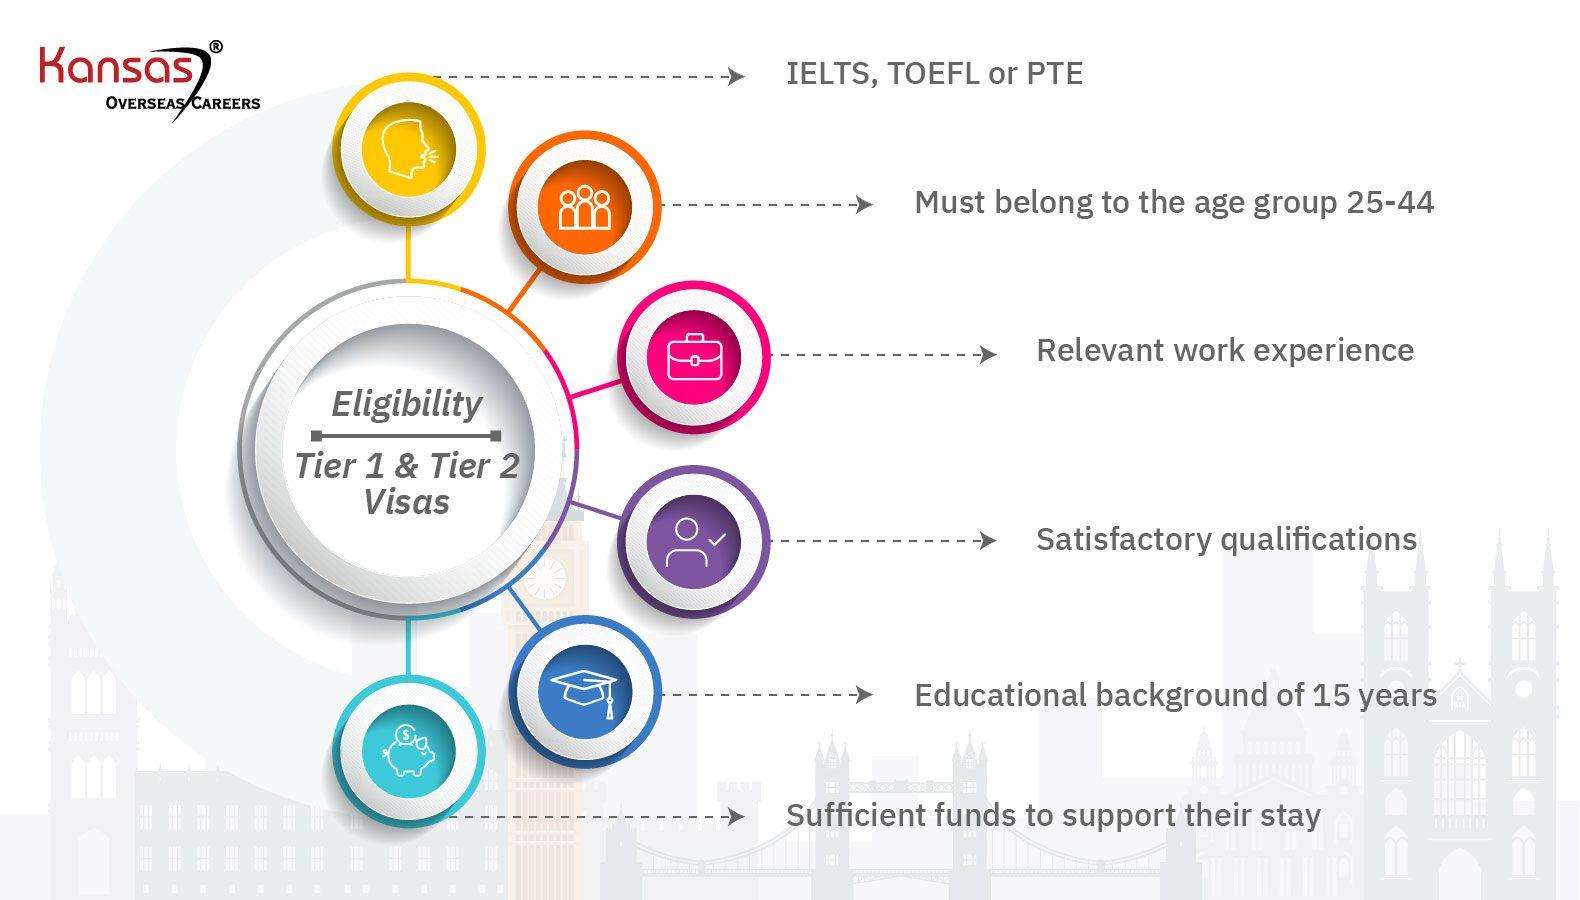 Eligibility-Criteria-for-Tier-1-and-Tier-2-visa